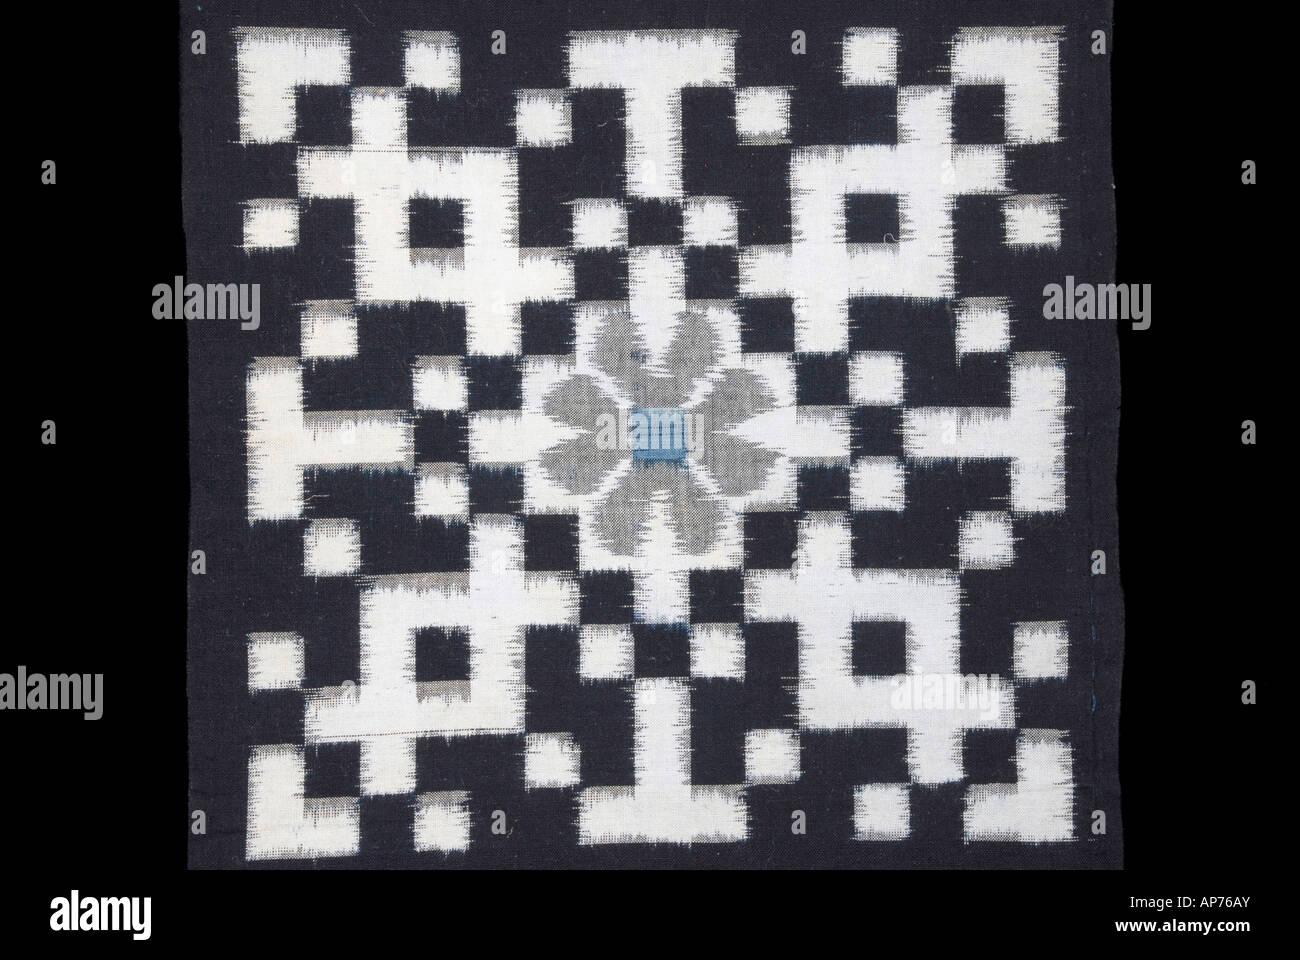 Detail of an indigo dyed ikat kasuri fabric from Japan - Stock Image